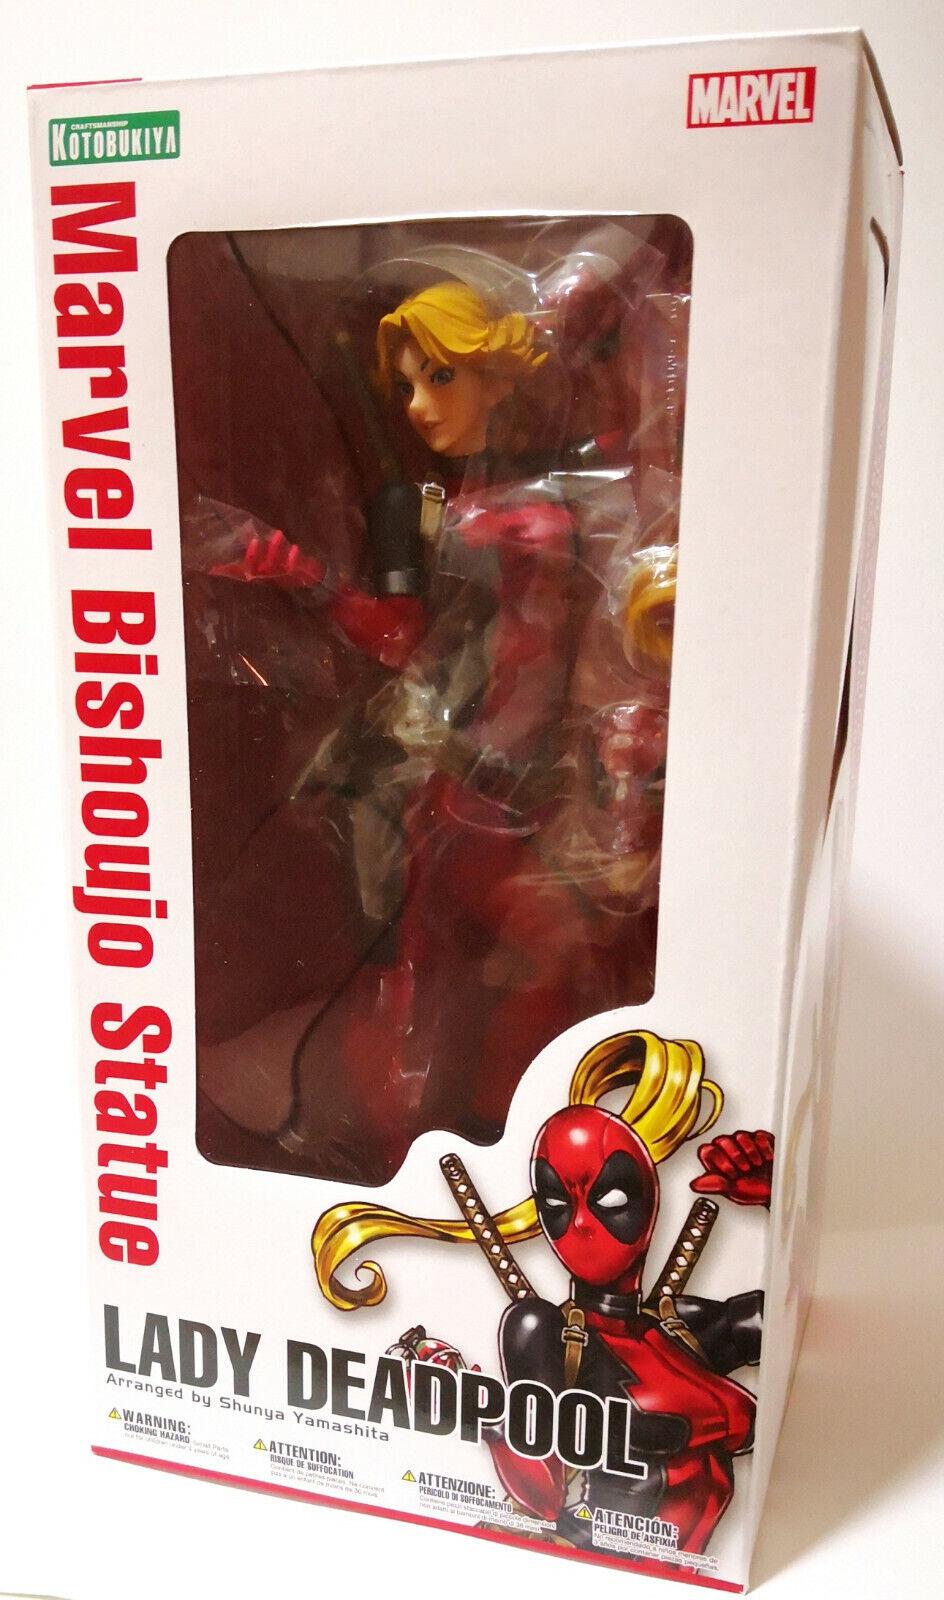 Kotobukiya förundras serier  Lady Deadpool Bishoujo 1  7 skala Figur